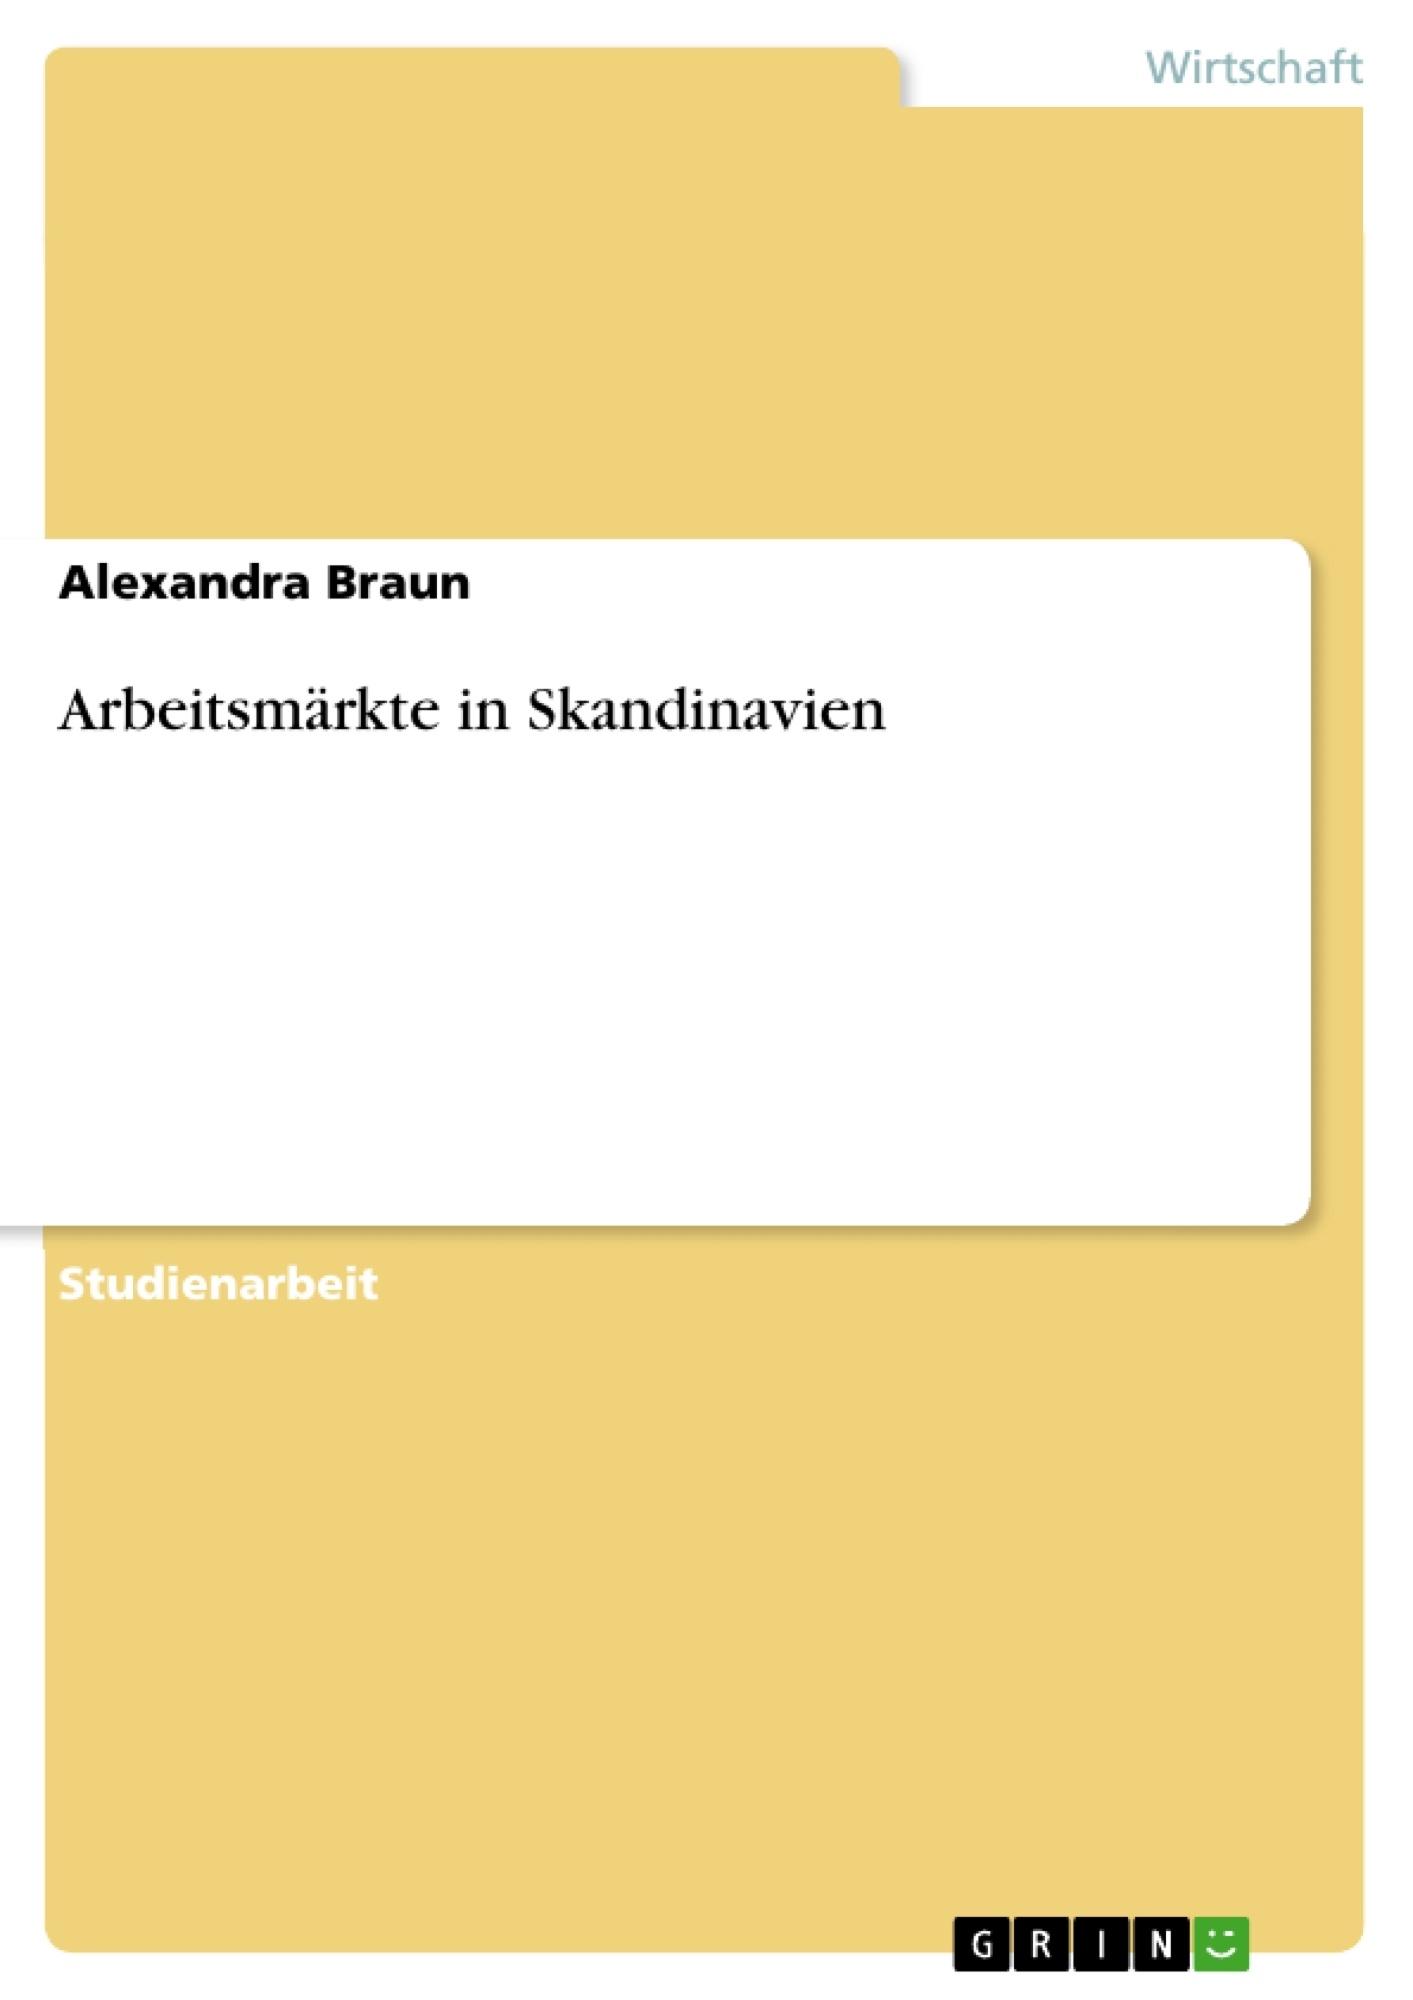 Titel: Arbeitsmärkte in Skandinavien